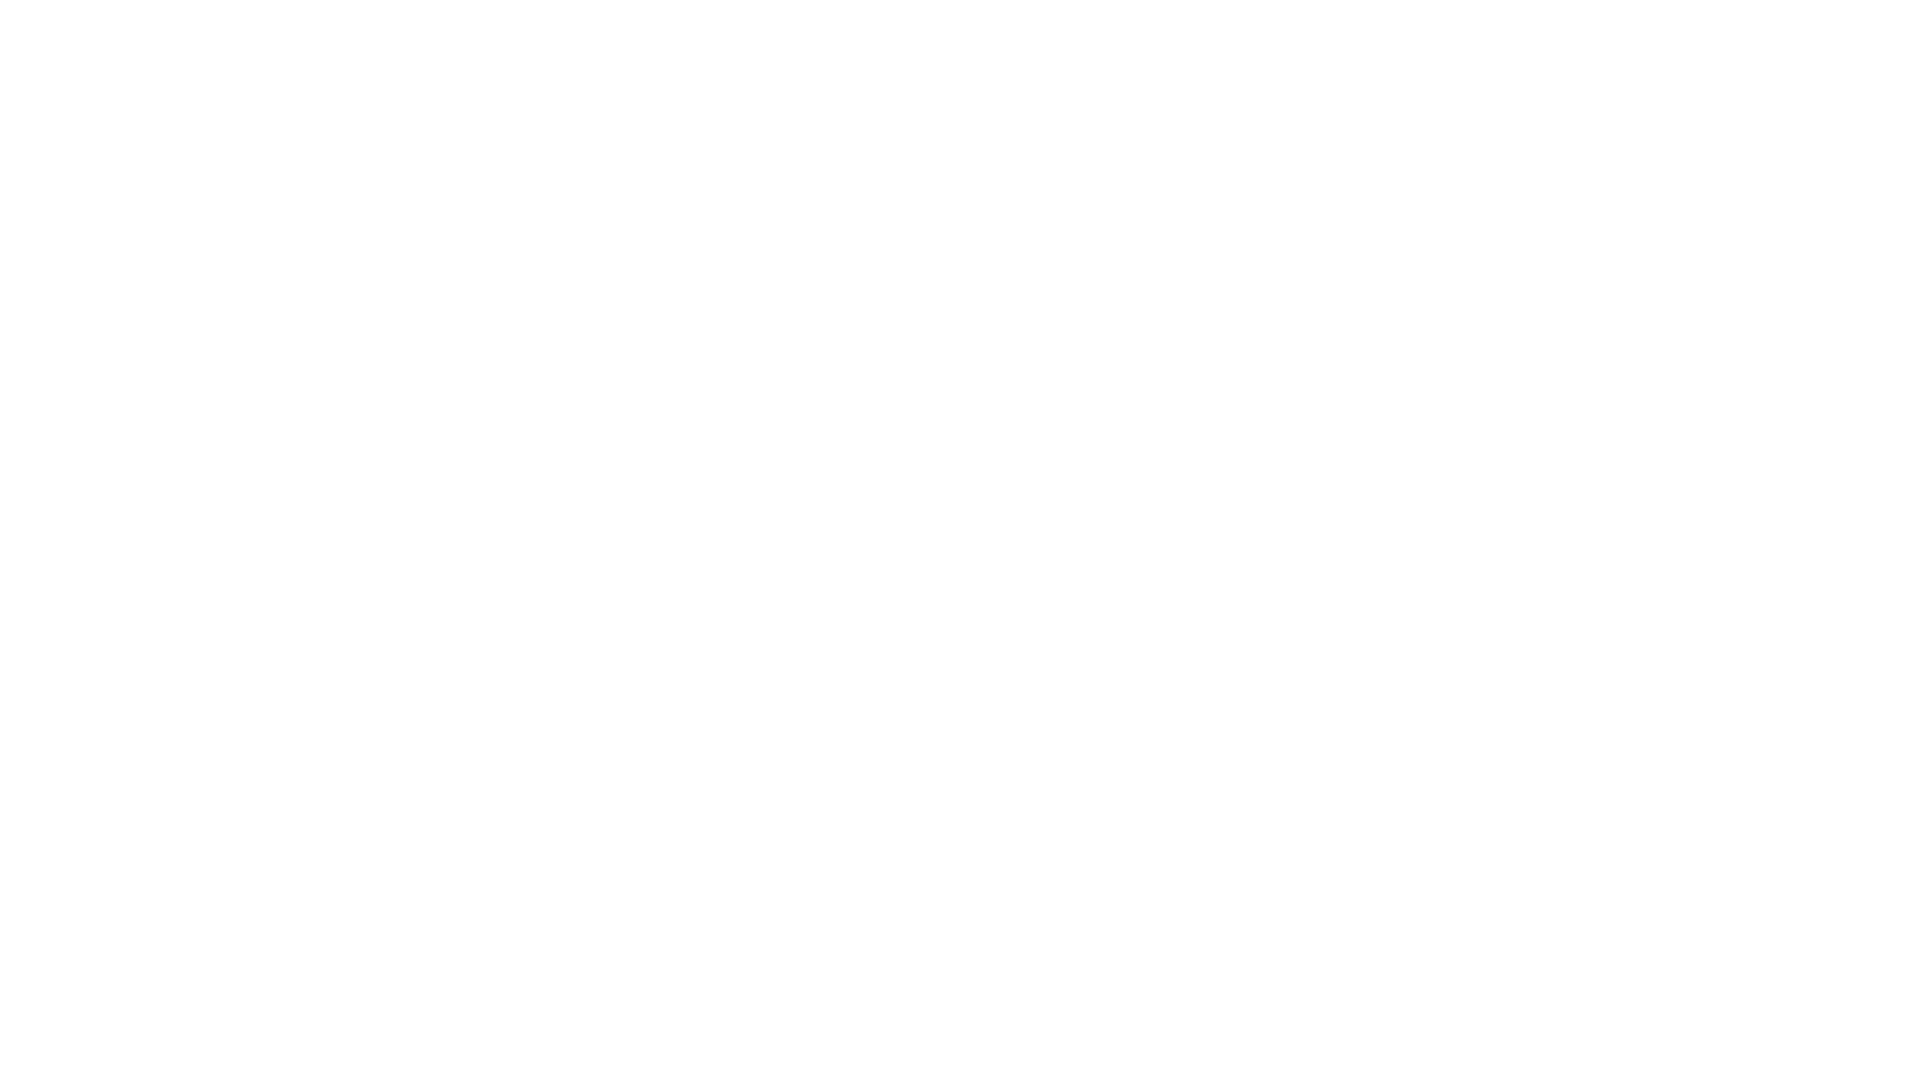 testpost1